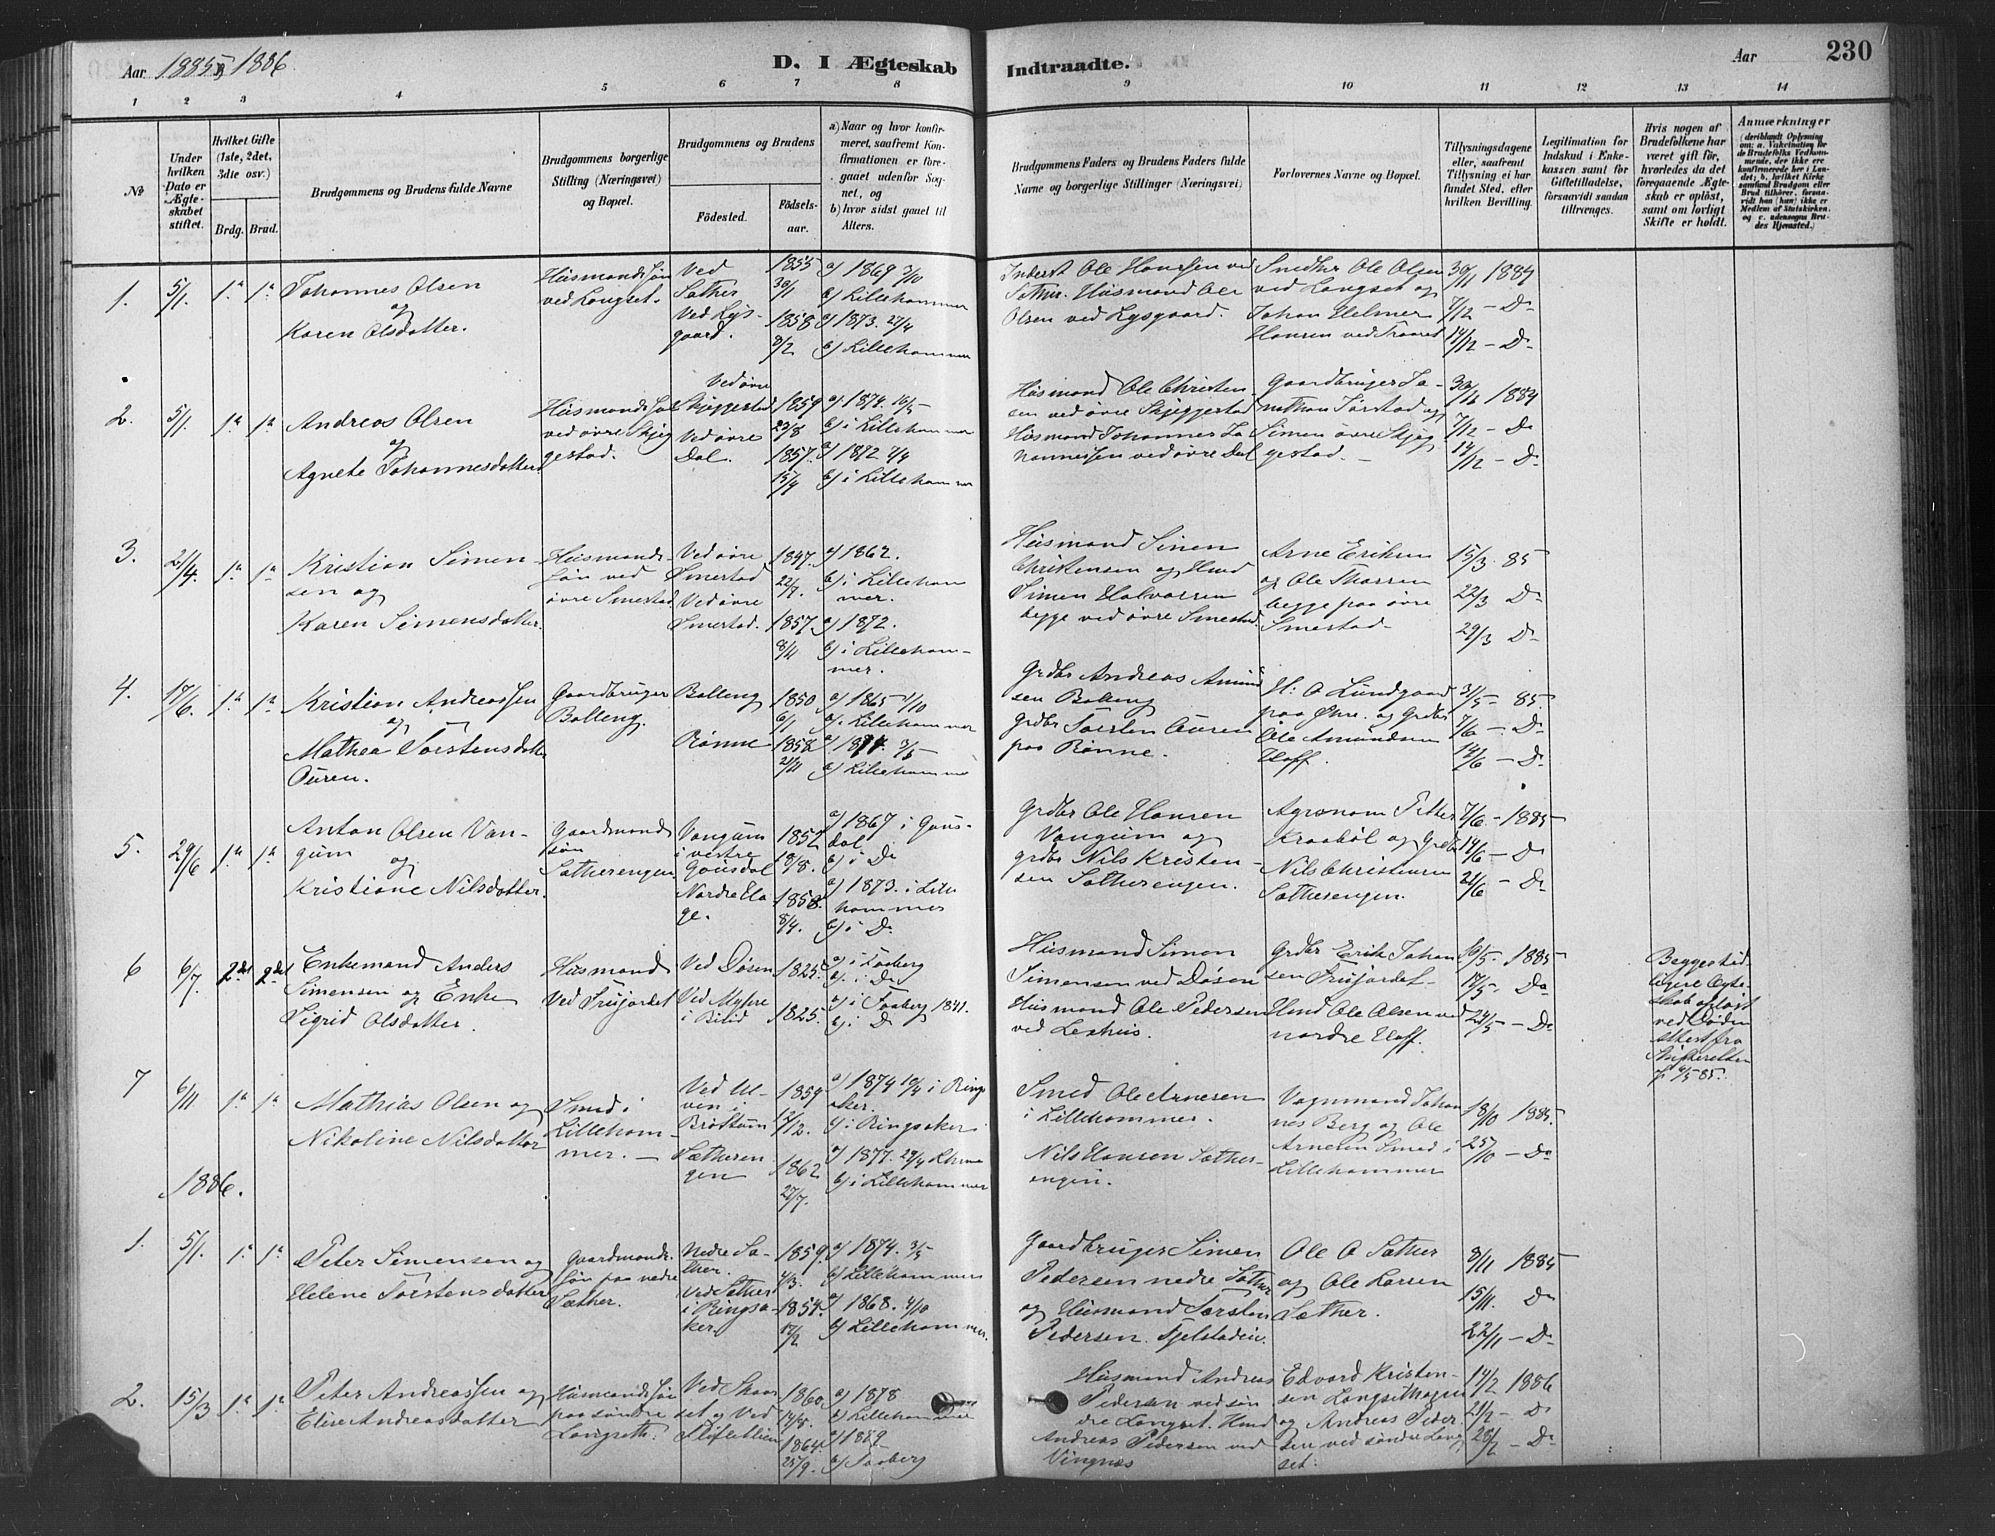 SAH, Fåberg prestekontor, Ministerialbok nr. 9, 1879-1898, s. 230